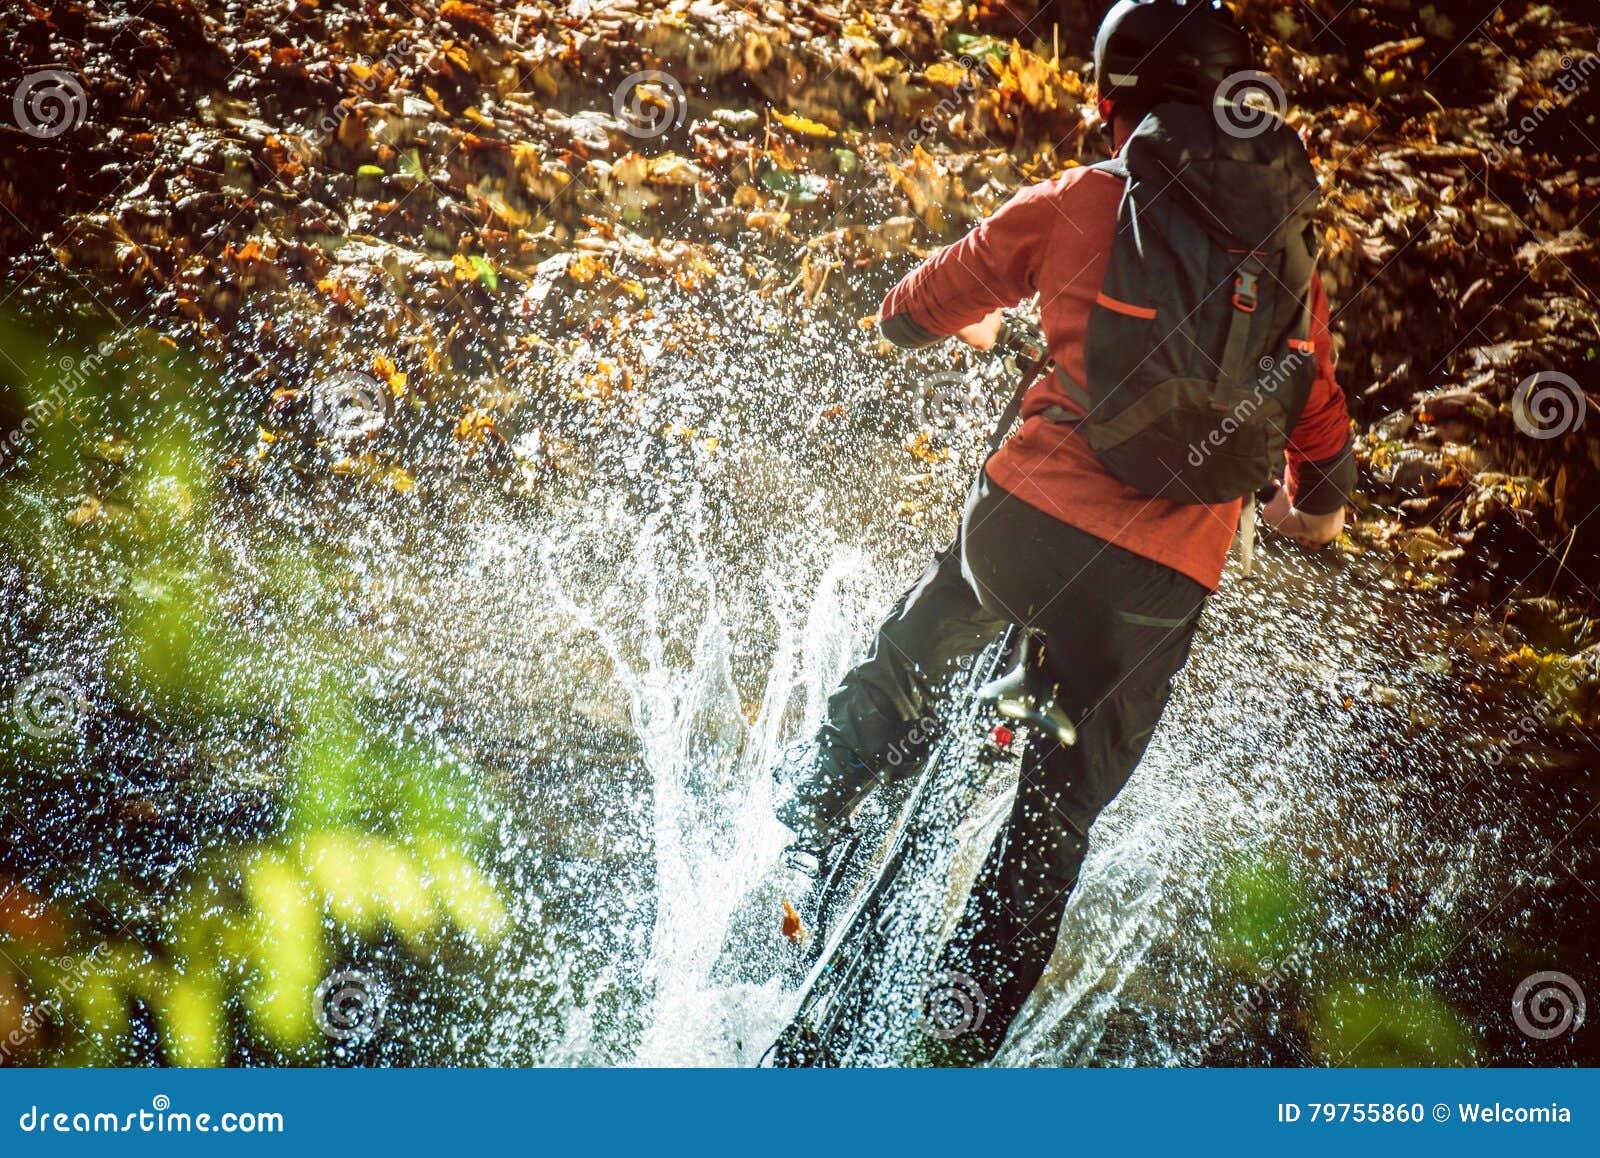 High Speed Bike Ride